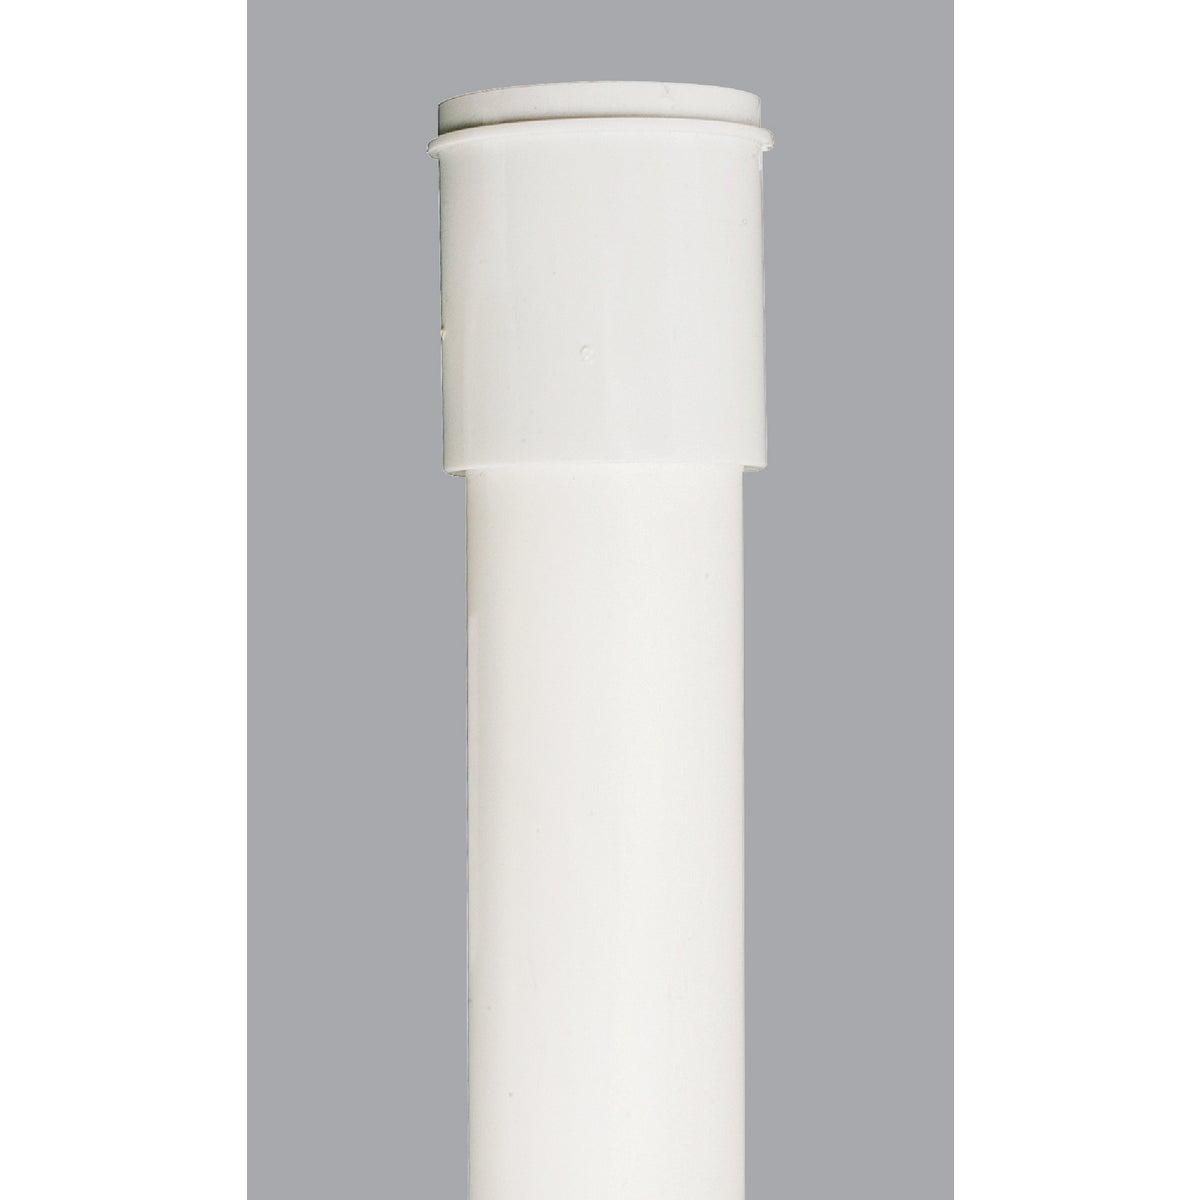 Plumb Pak/Keeney Mfg. 1-1/2X6 SOLV EXT TUBE 20-6WK